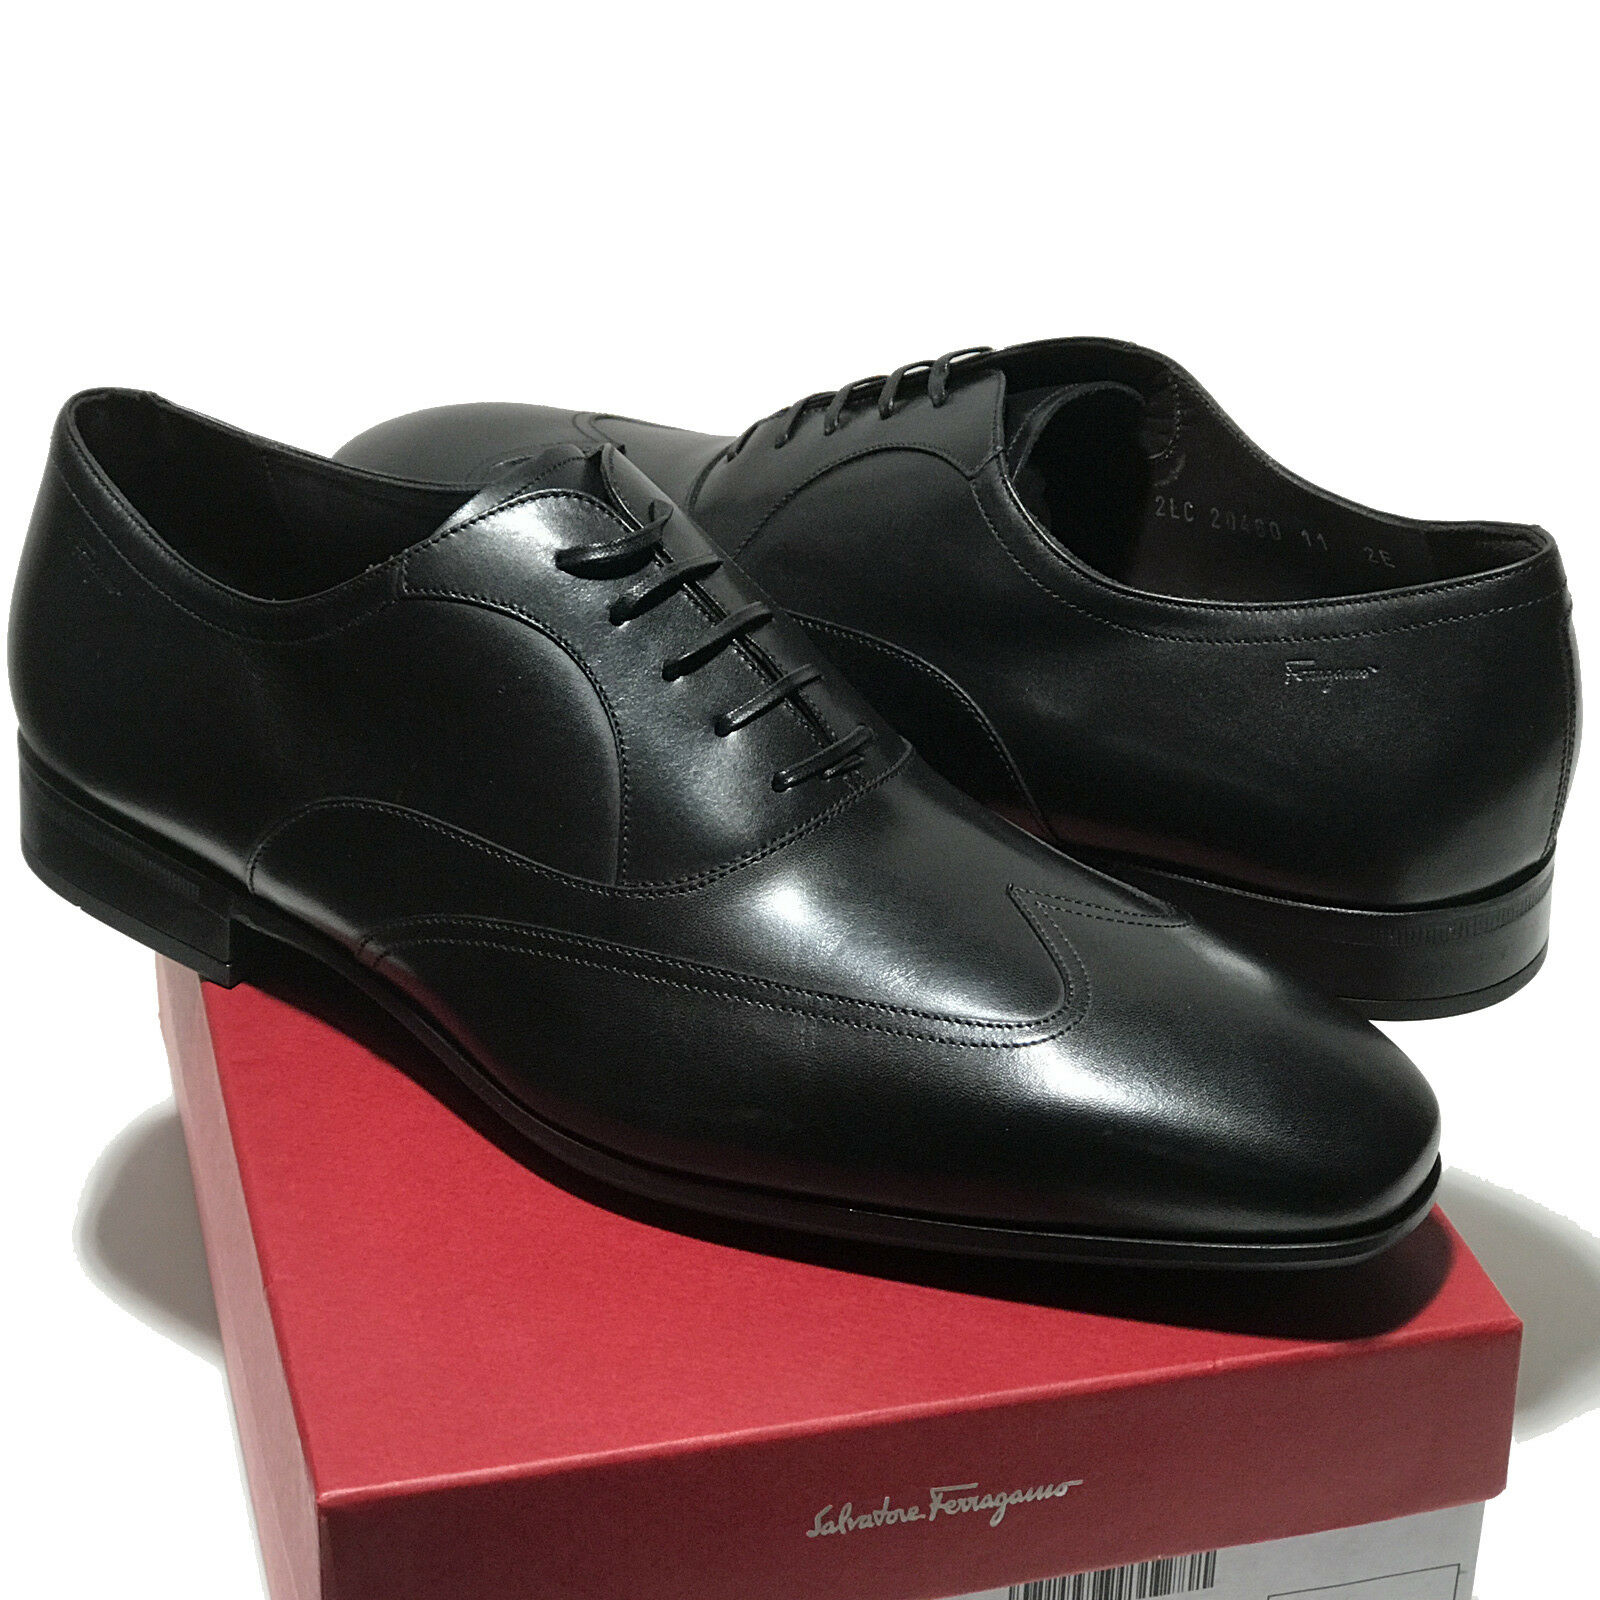 FERRAGAMO NOVE Black Wingtip Leather Oxford 10 Men's Dress Fashion Casual shoes